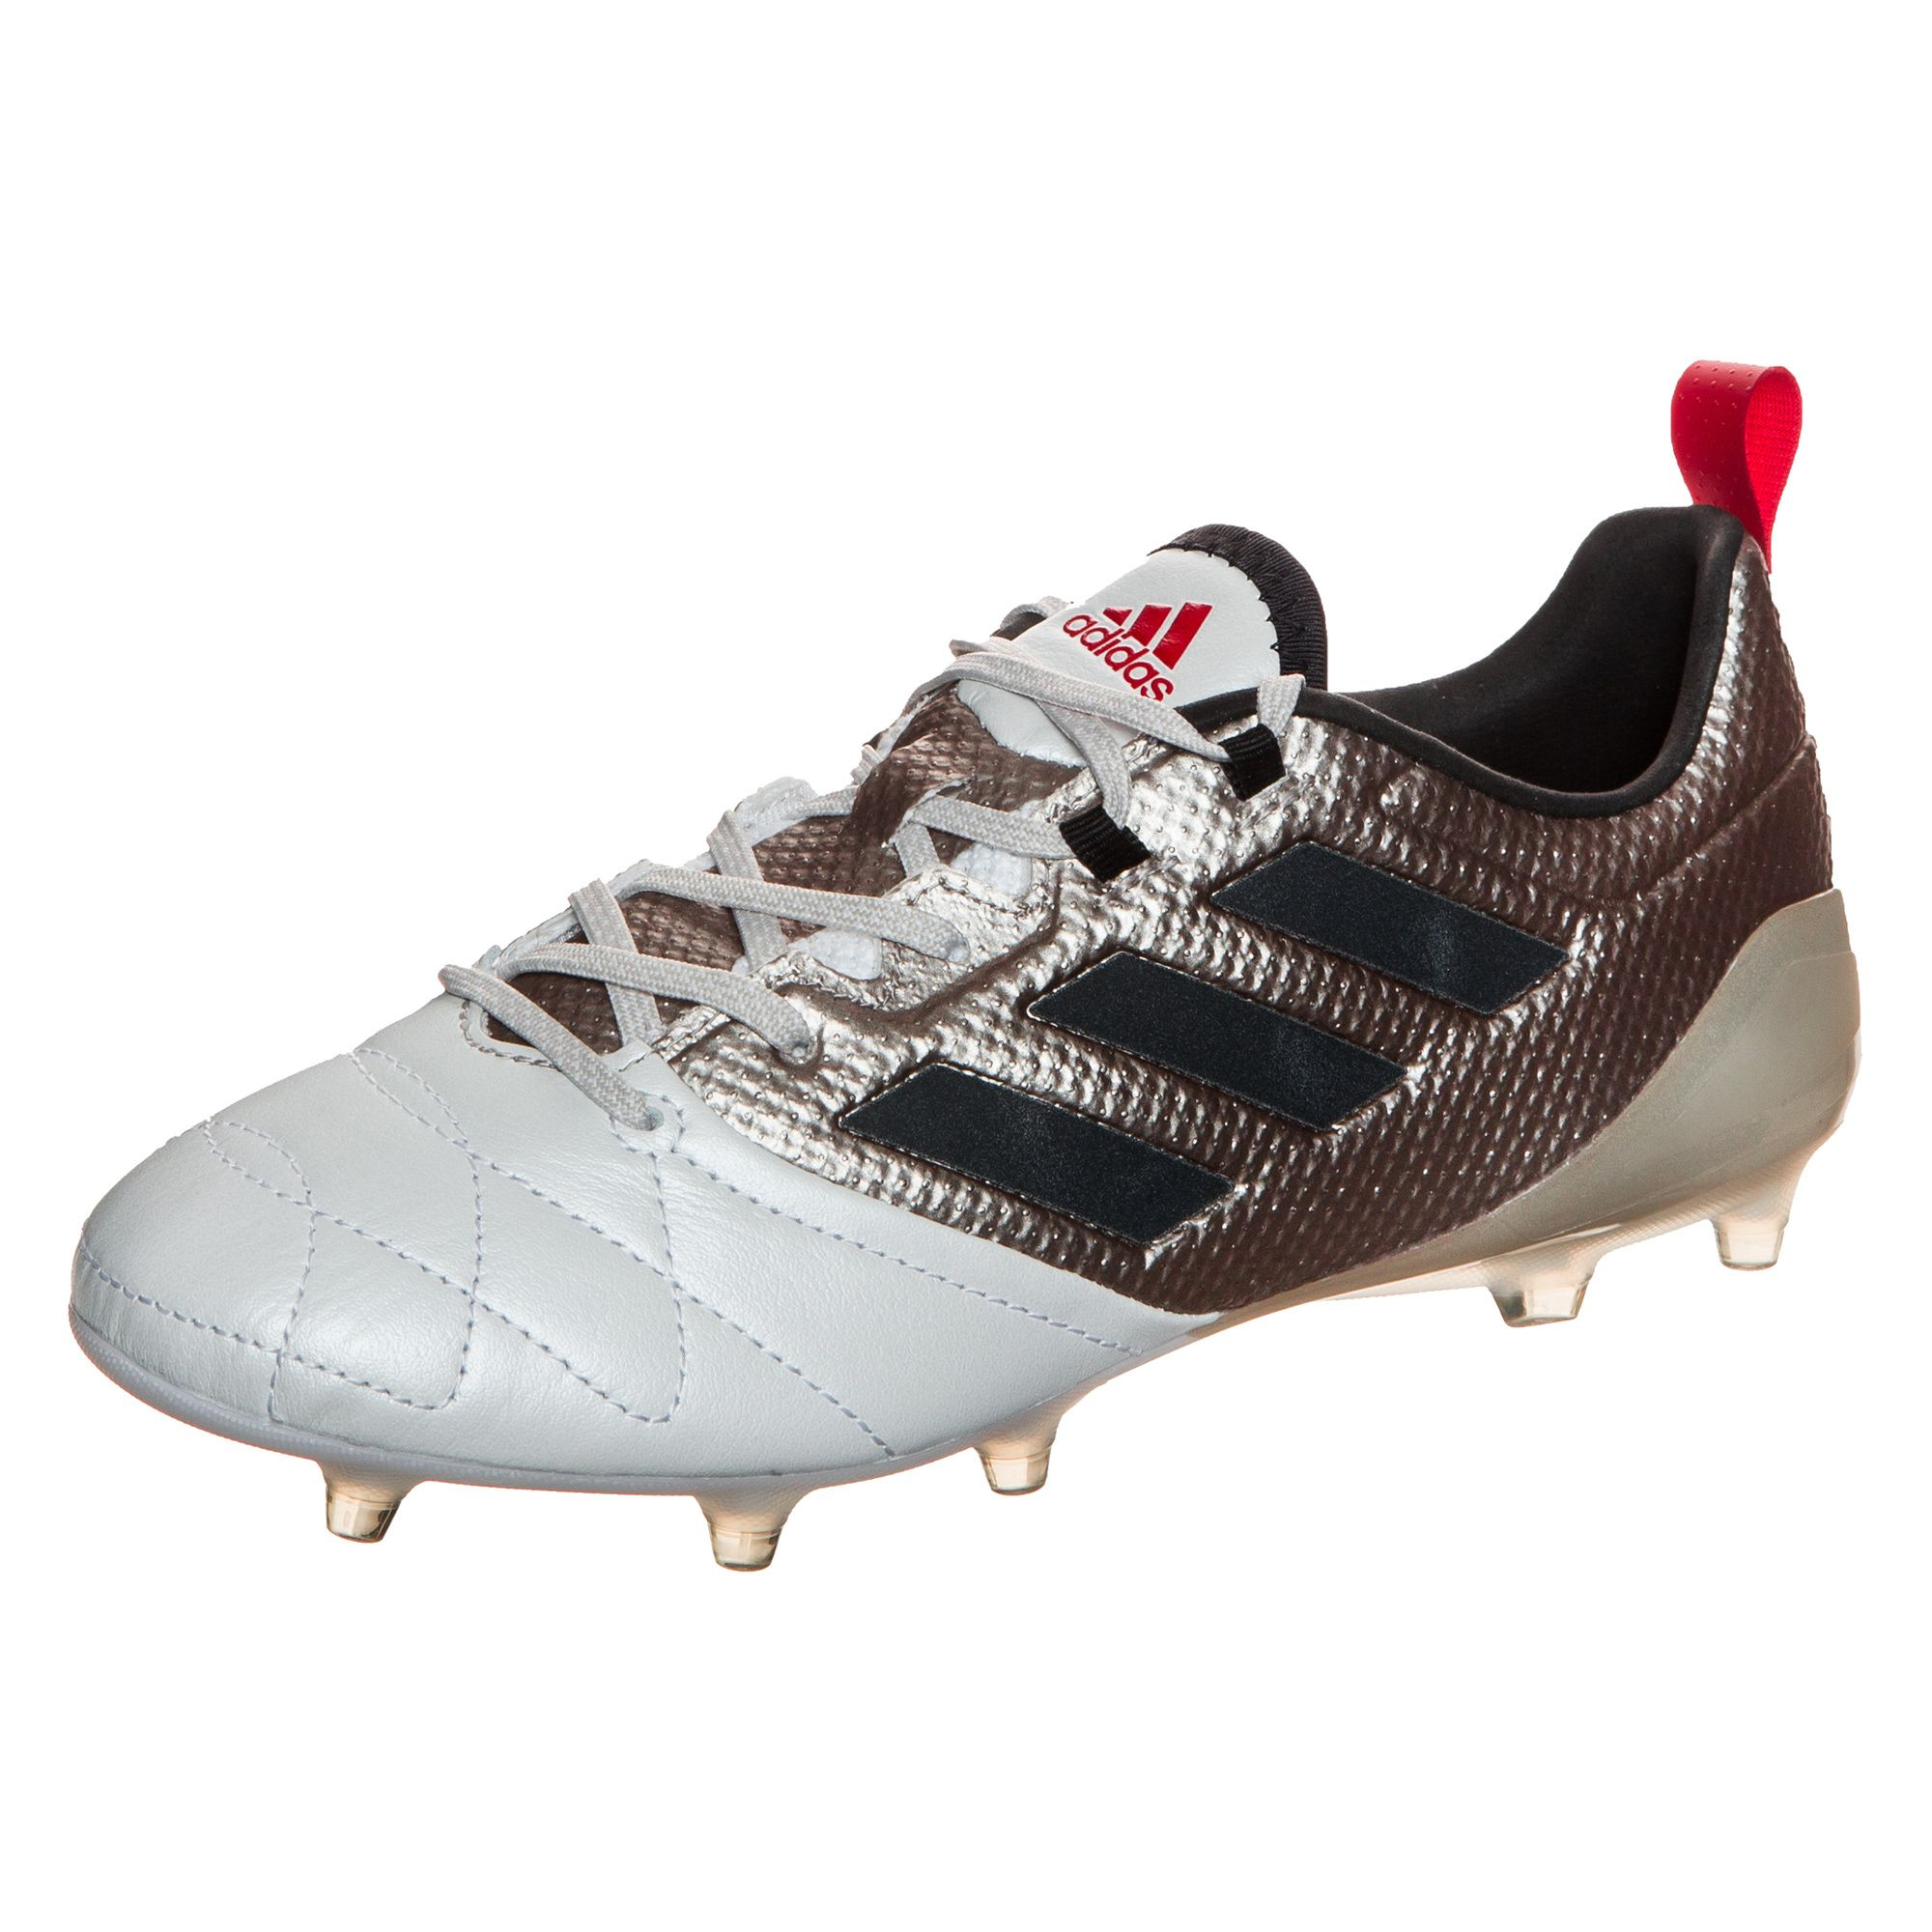 ADIDAS PERFORMANCE adidas Performance ACE 17.1 FG Fußballschuh Damen